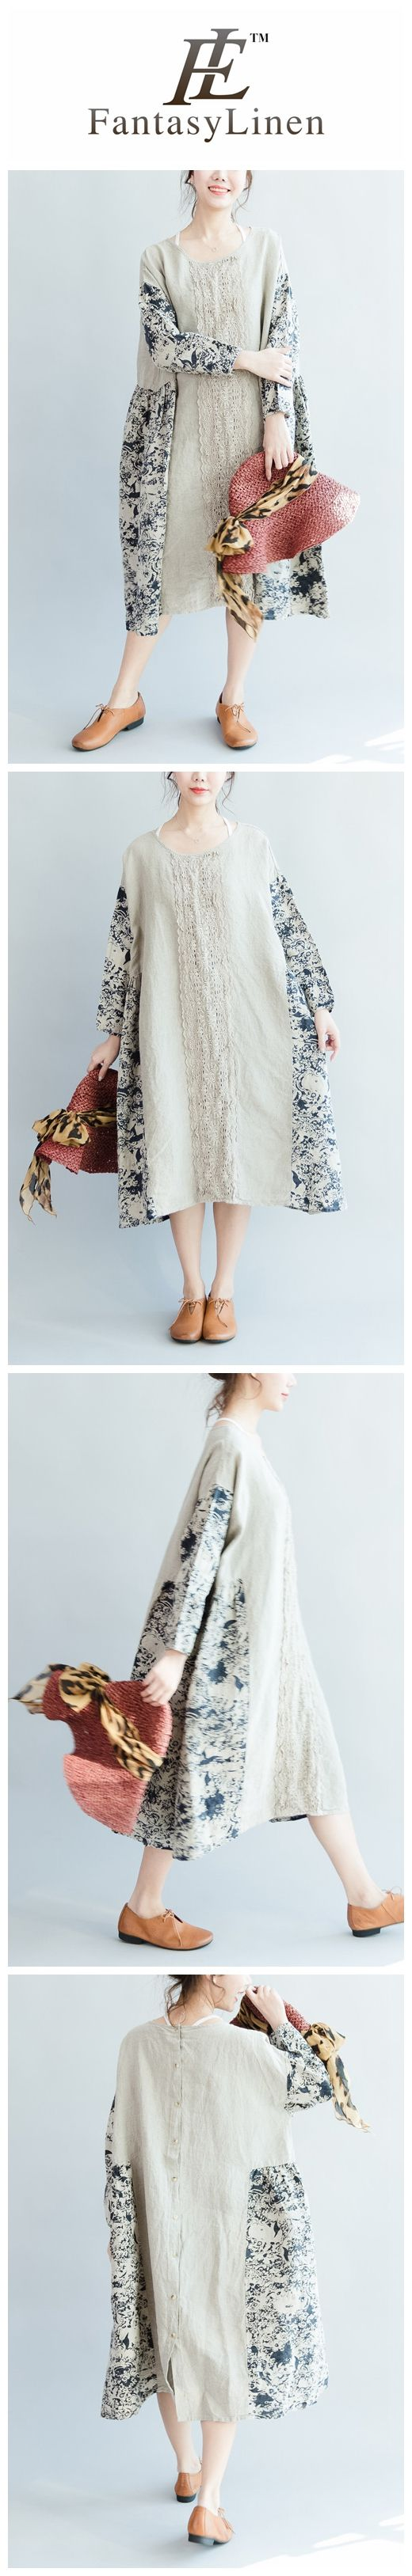 Loose Casual Foral Cotton Linen Dress Women Clothes